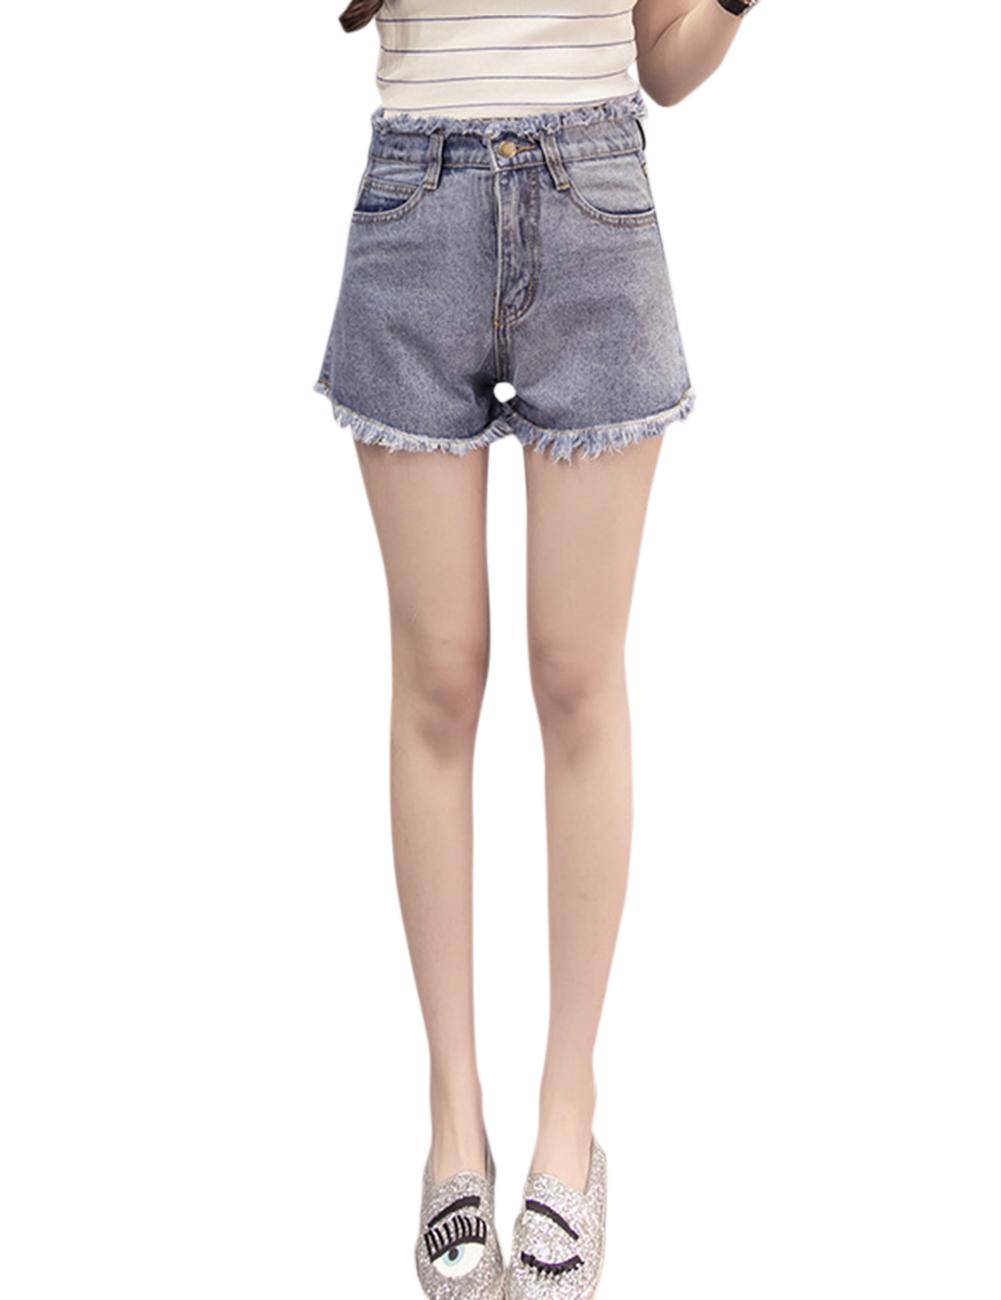 Women Stylish Denim Shorts High-waist Loose Short Pants Gift